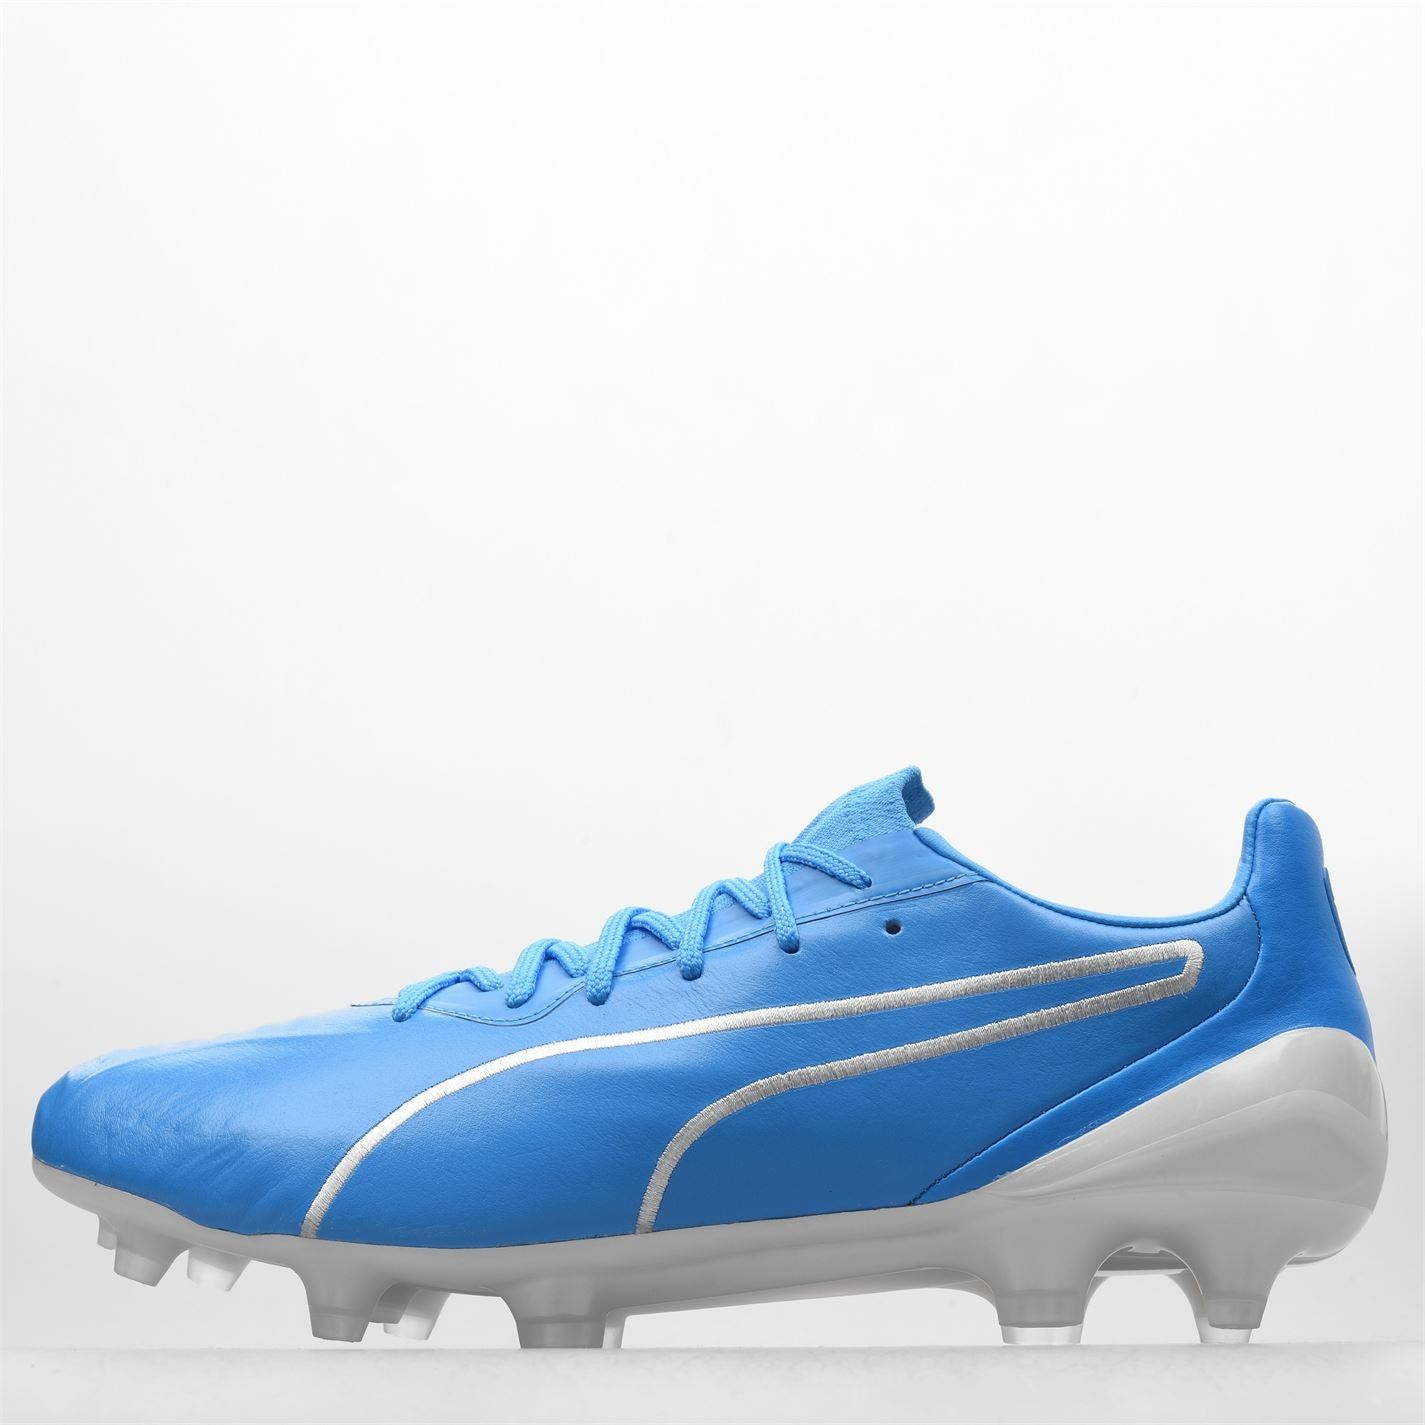 miniature 8 - Puma-King-FG-Firm-Ground-Football-Bottes-Homme-Chaussures-De-Foot-Crampons-Baskets